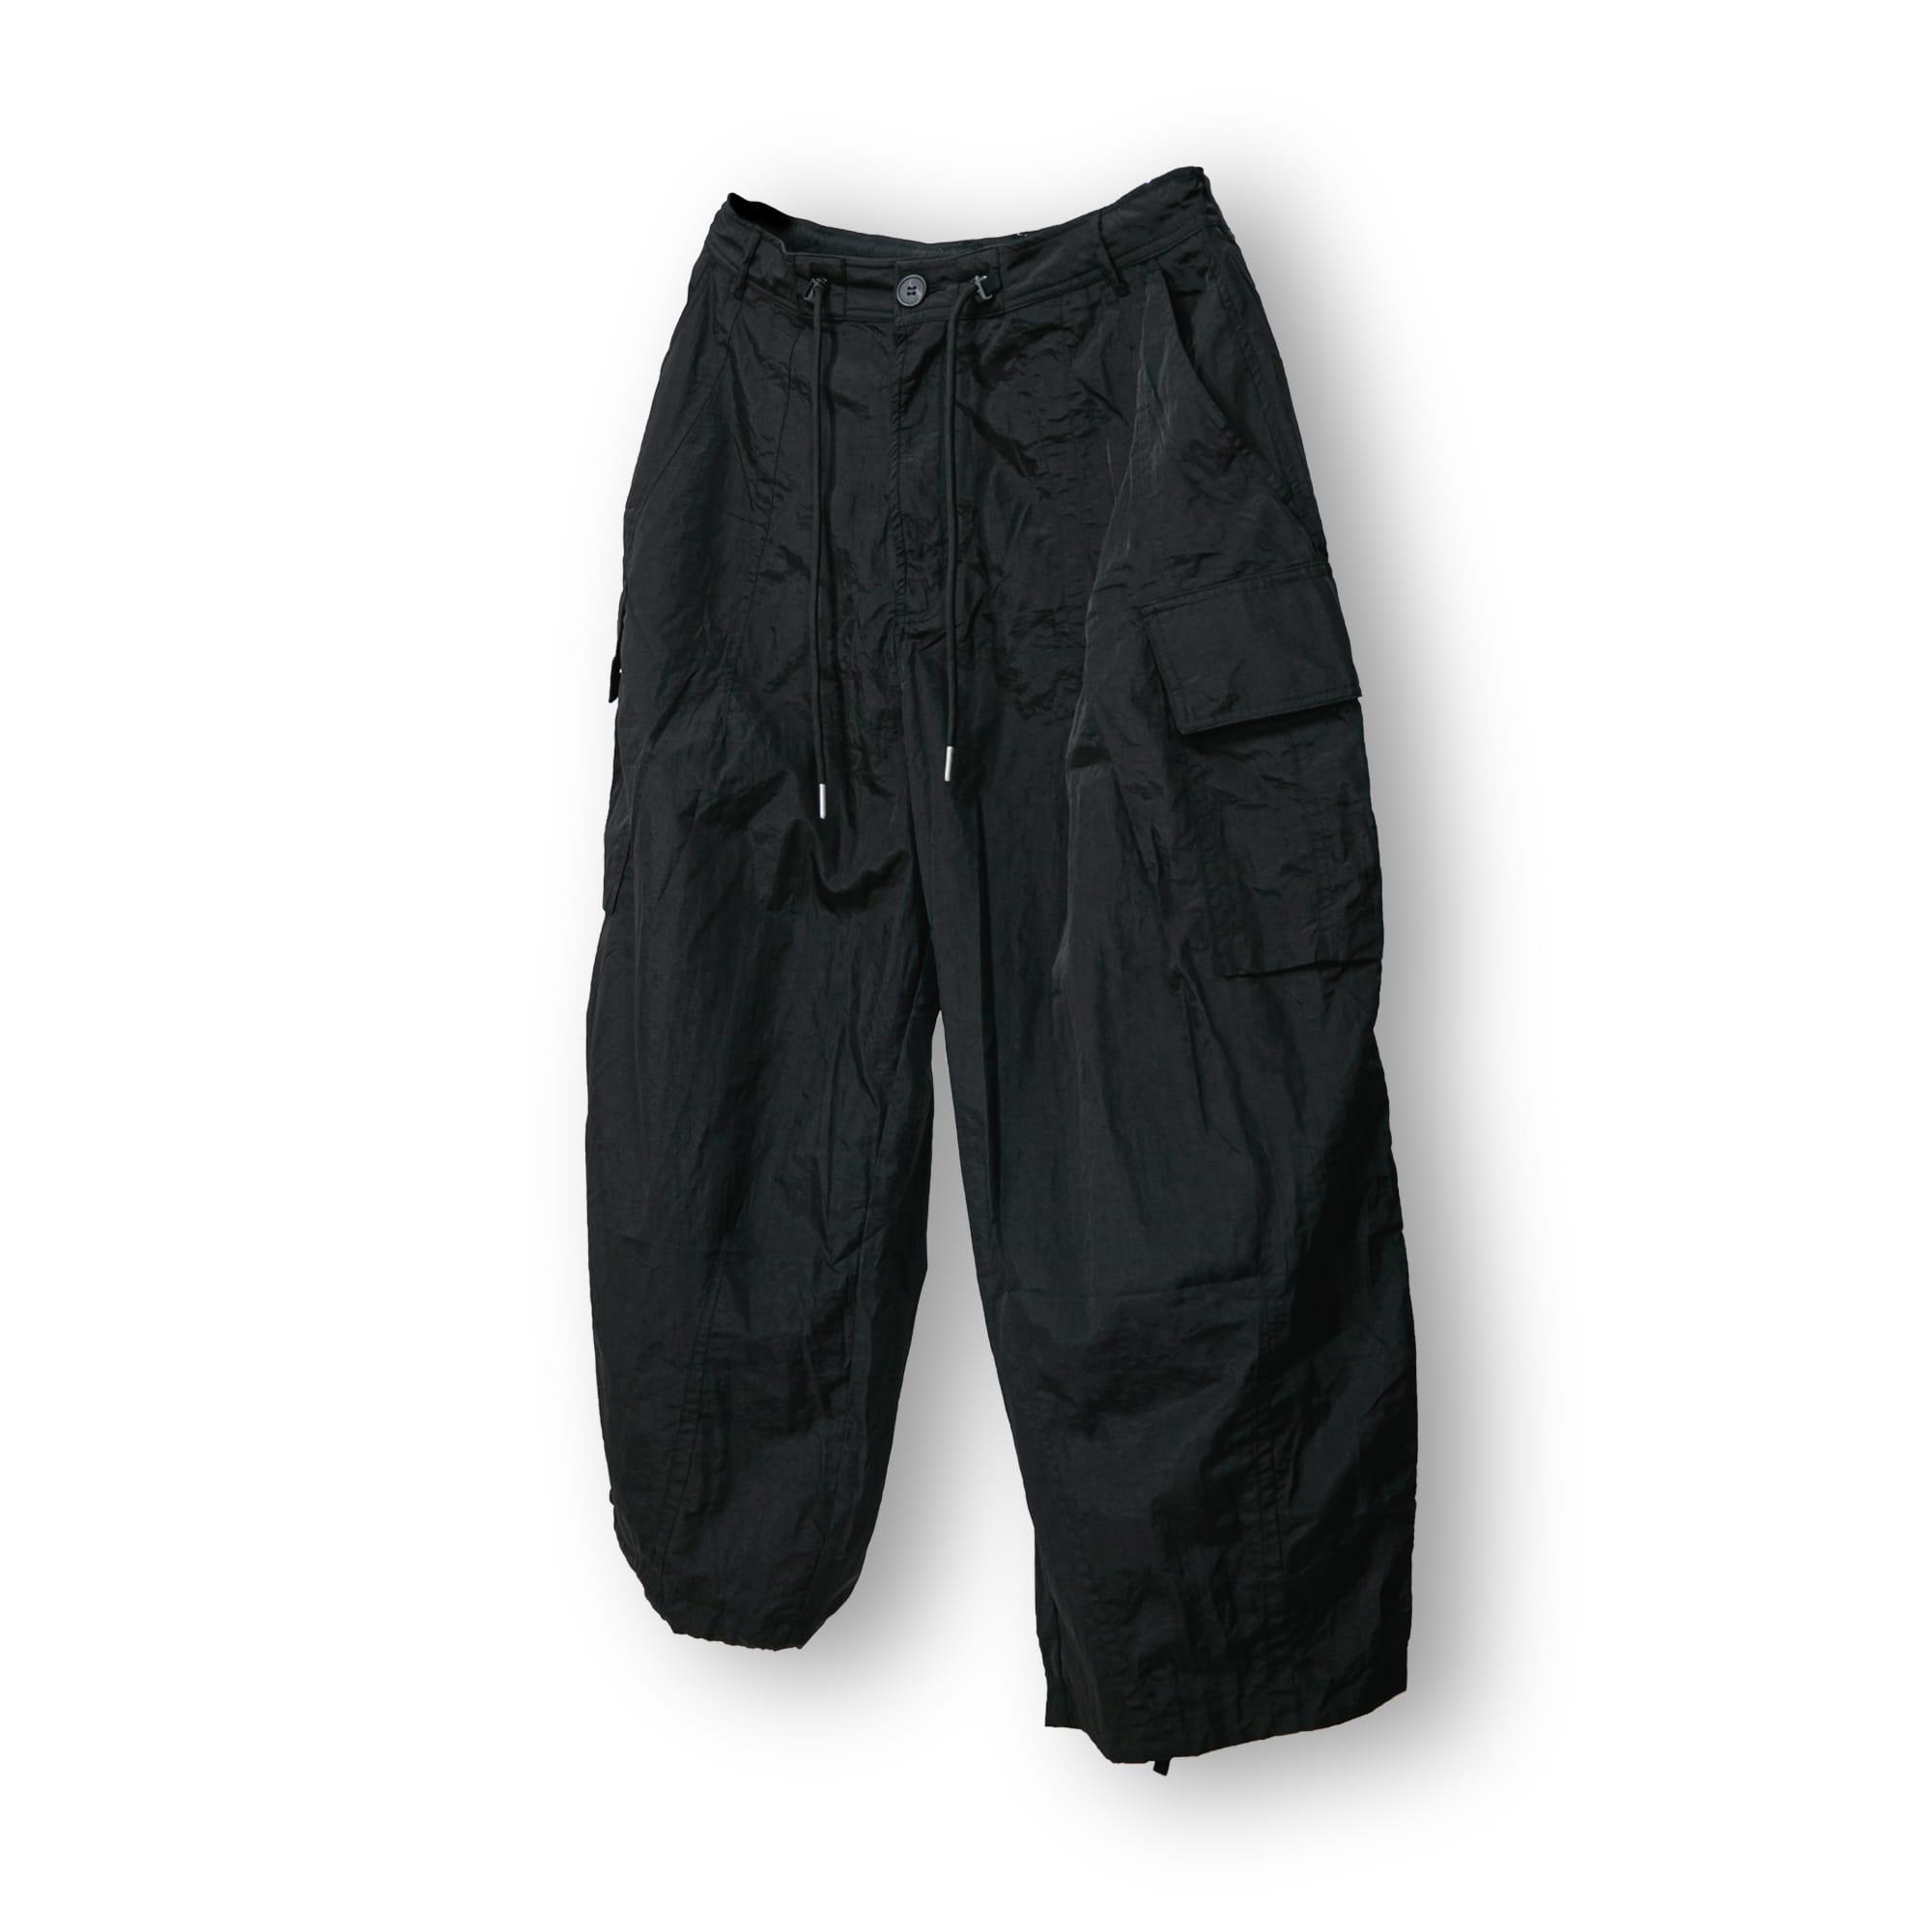 Nylon Touch Cargo Balloon Pants - Black